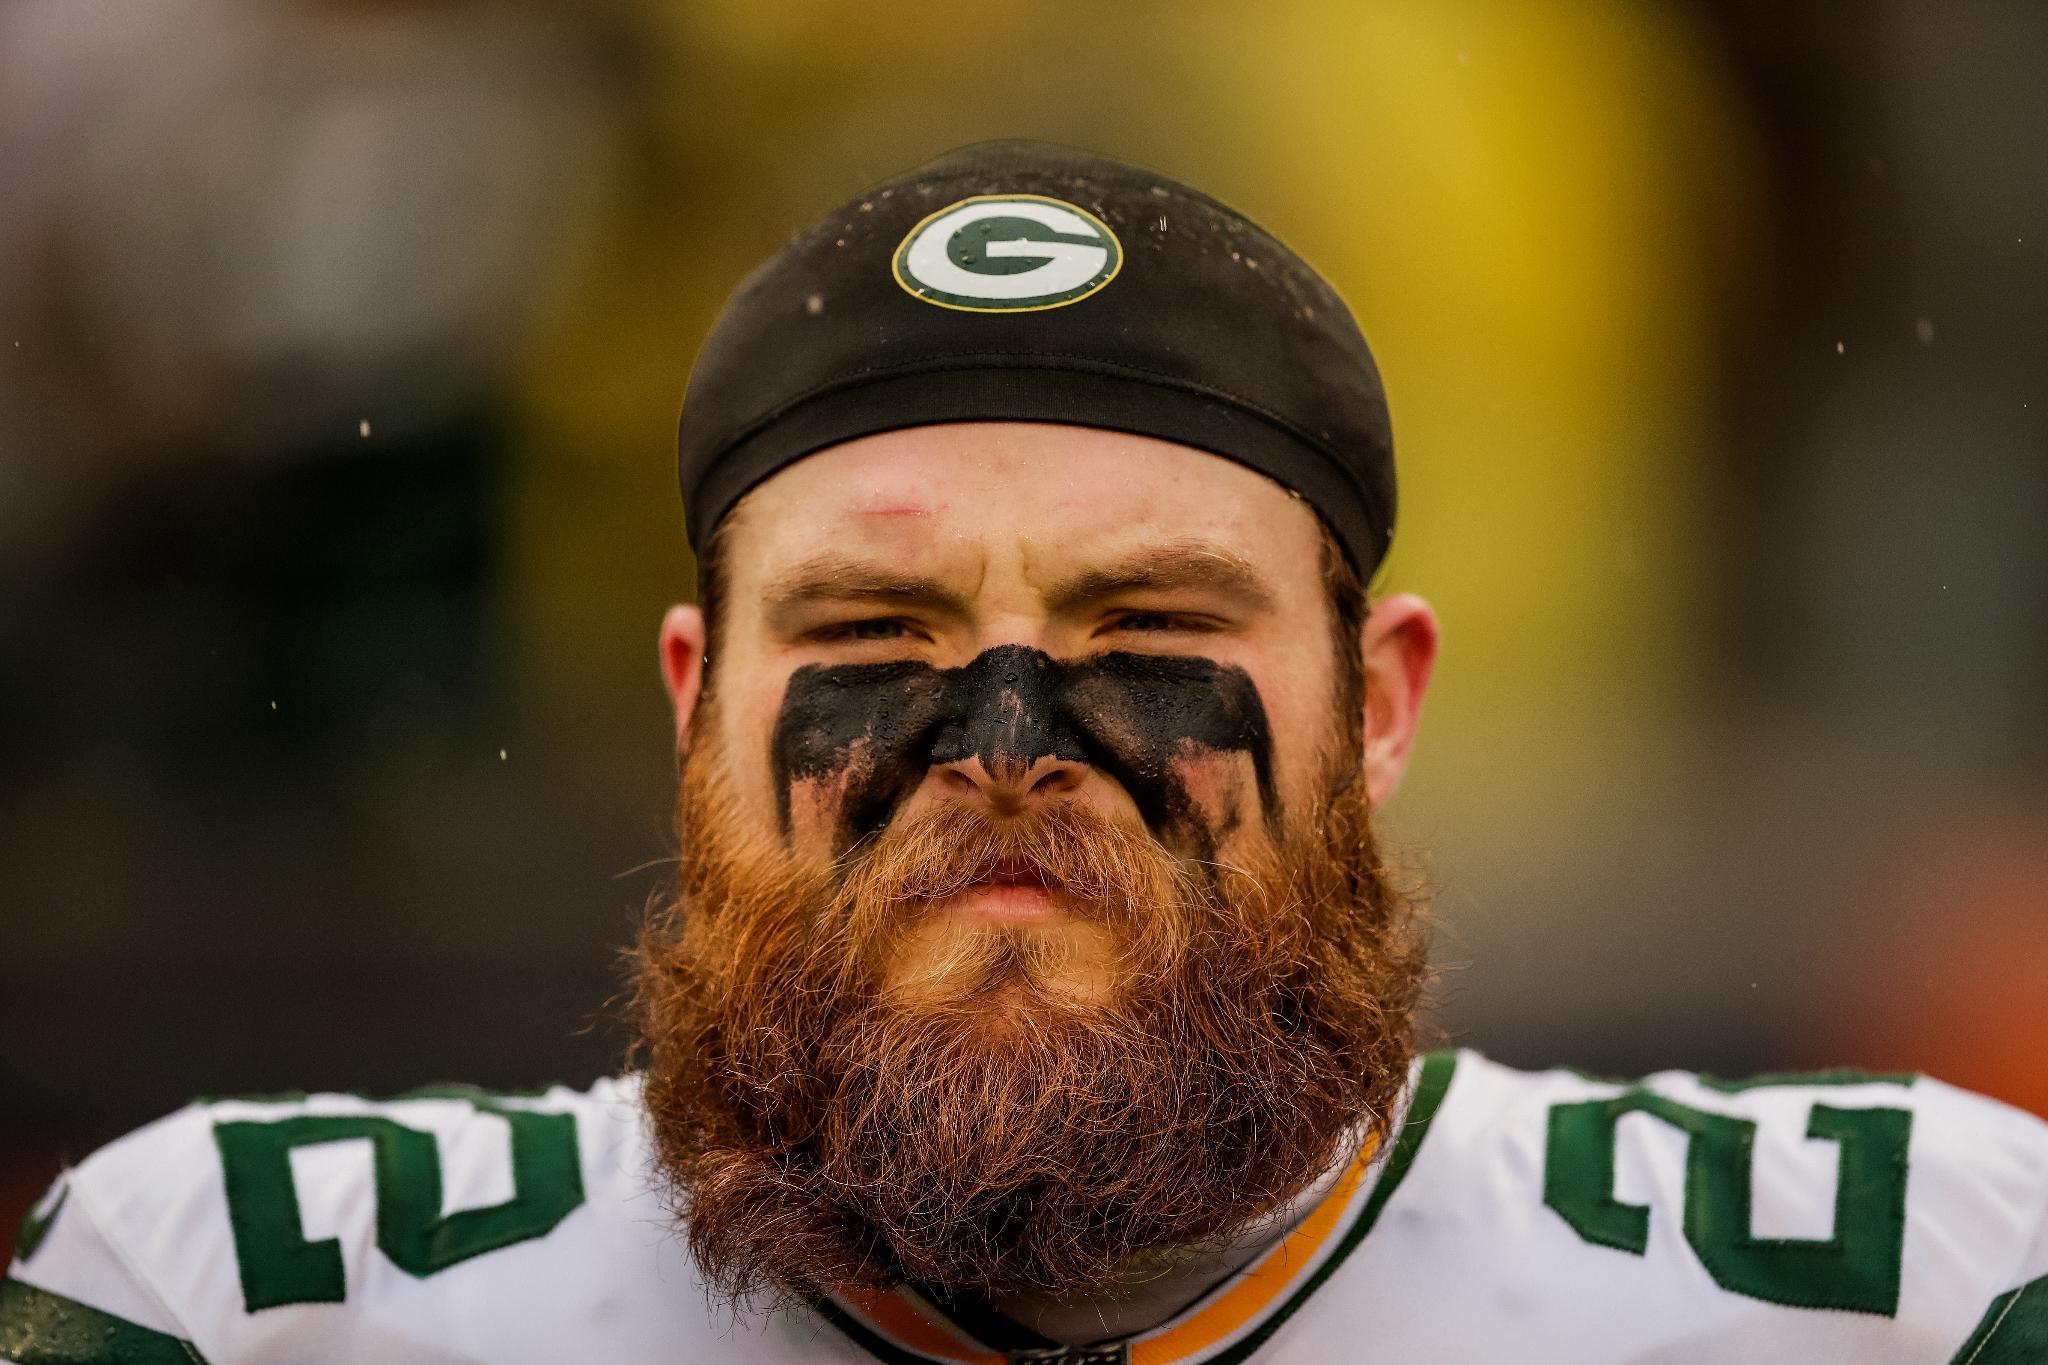 Take a look at #Packers FB @AaronRipkowski's best photos from the 2017 season.  ��: https://t.co/Xo68Yn7JMz https://t.co/QmUk7iyyuF